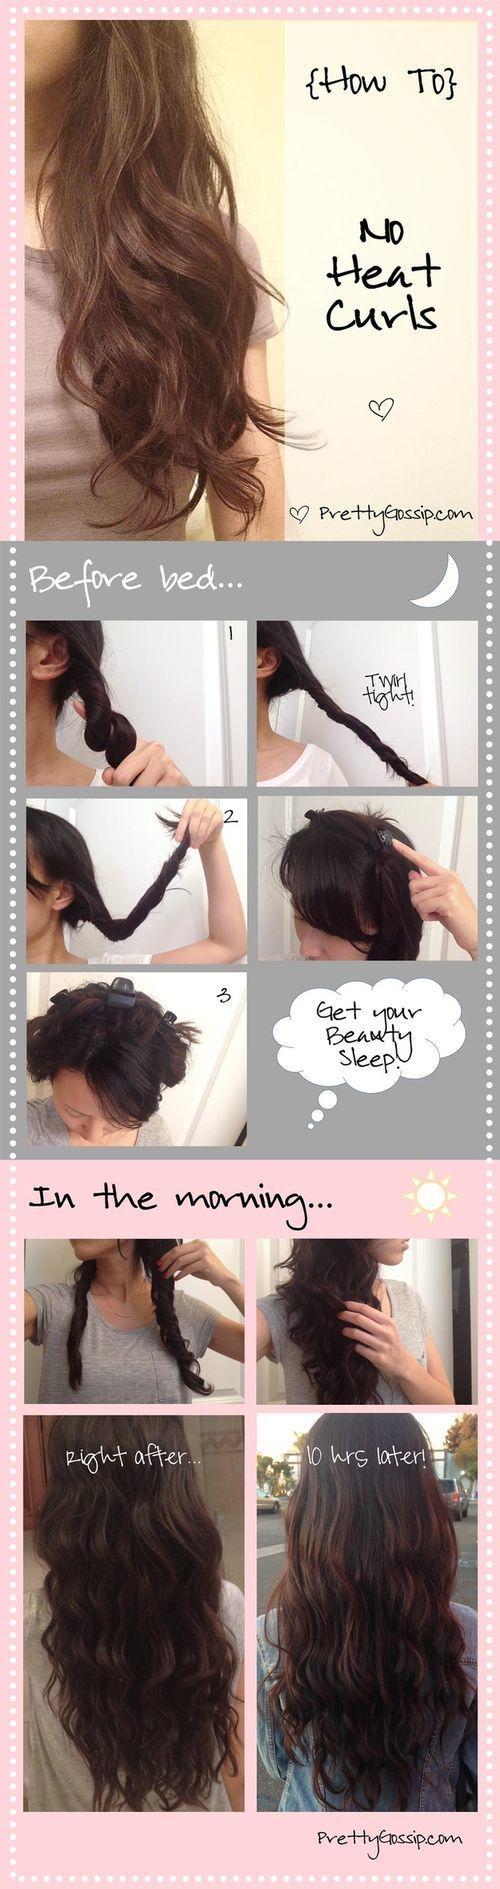 Overnight no heat natural curls